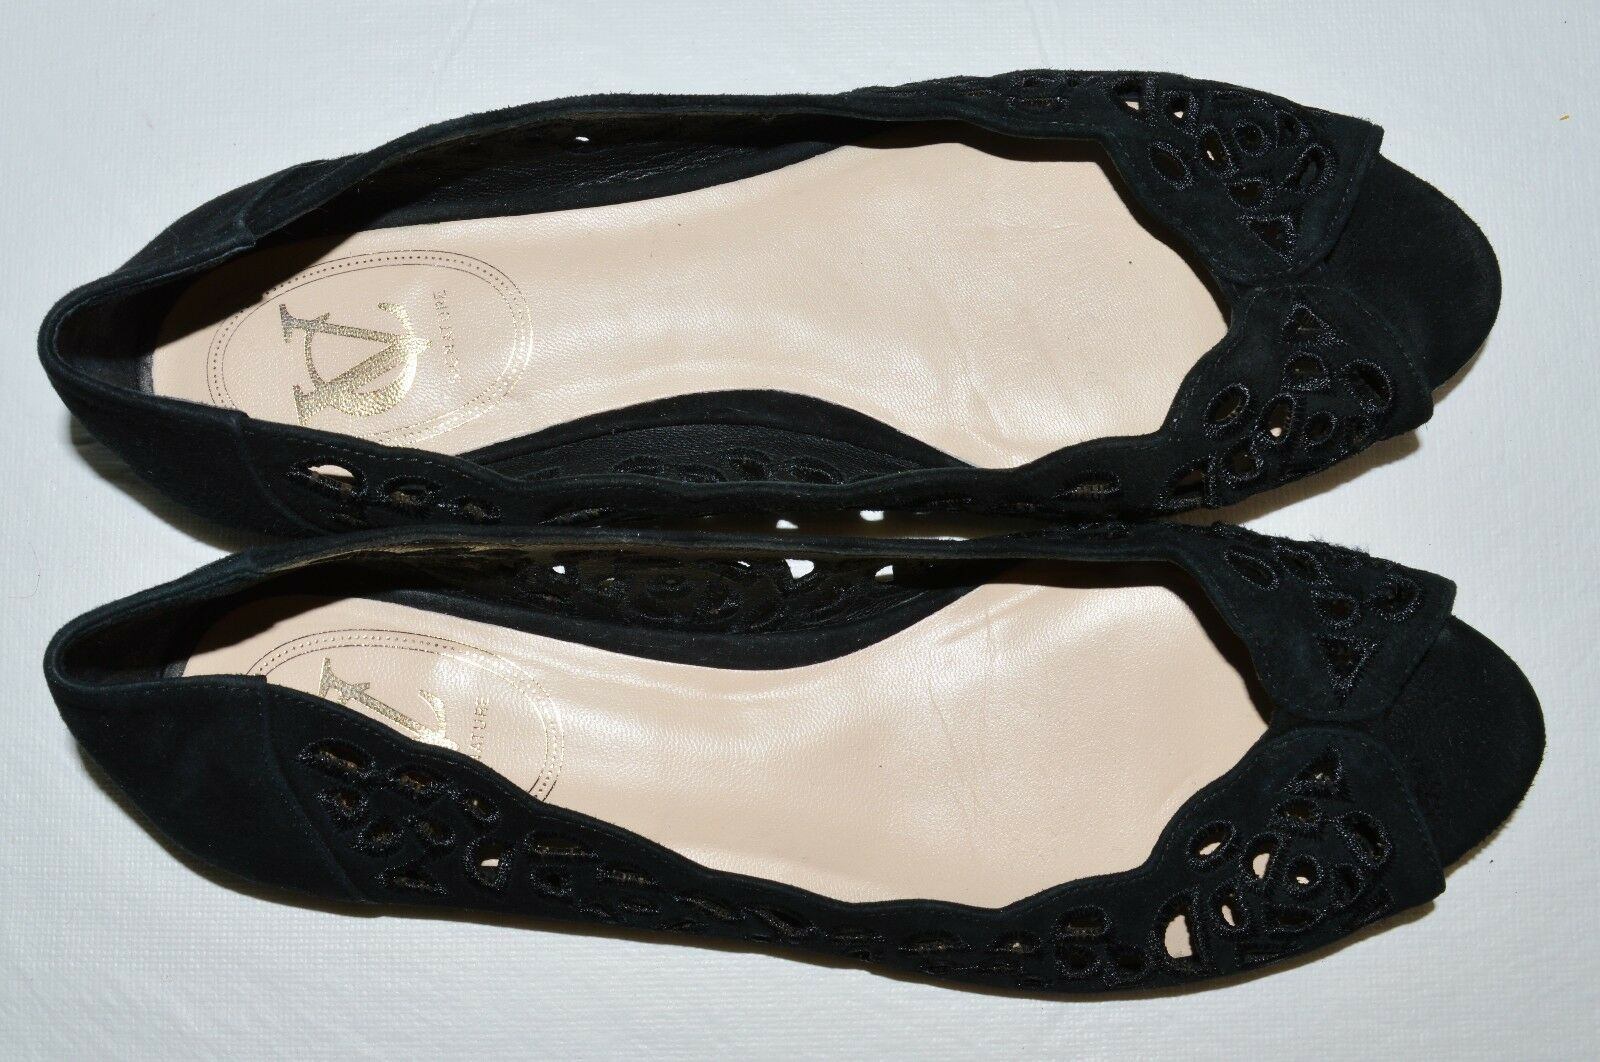 VC VINCE CAMUTO SIGNATURE CATLYN SZ 7 M BLACK 37 BLACK M SUEDE OPEN TOE FLATS Schuhe d2da0e